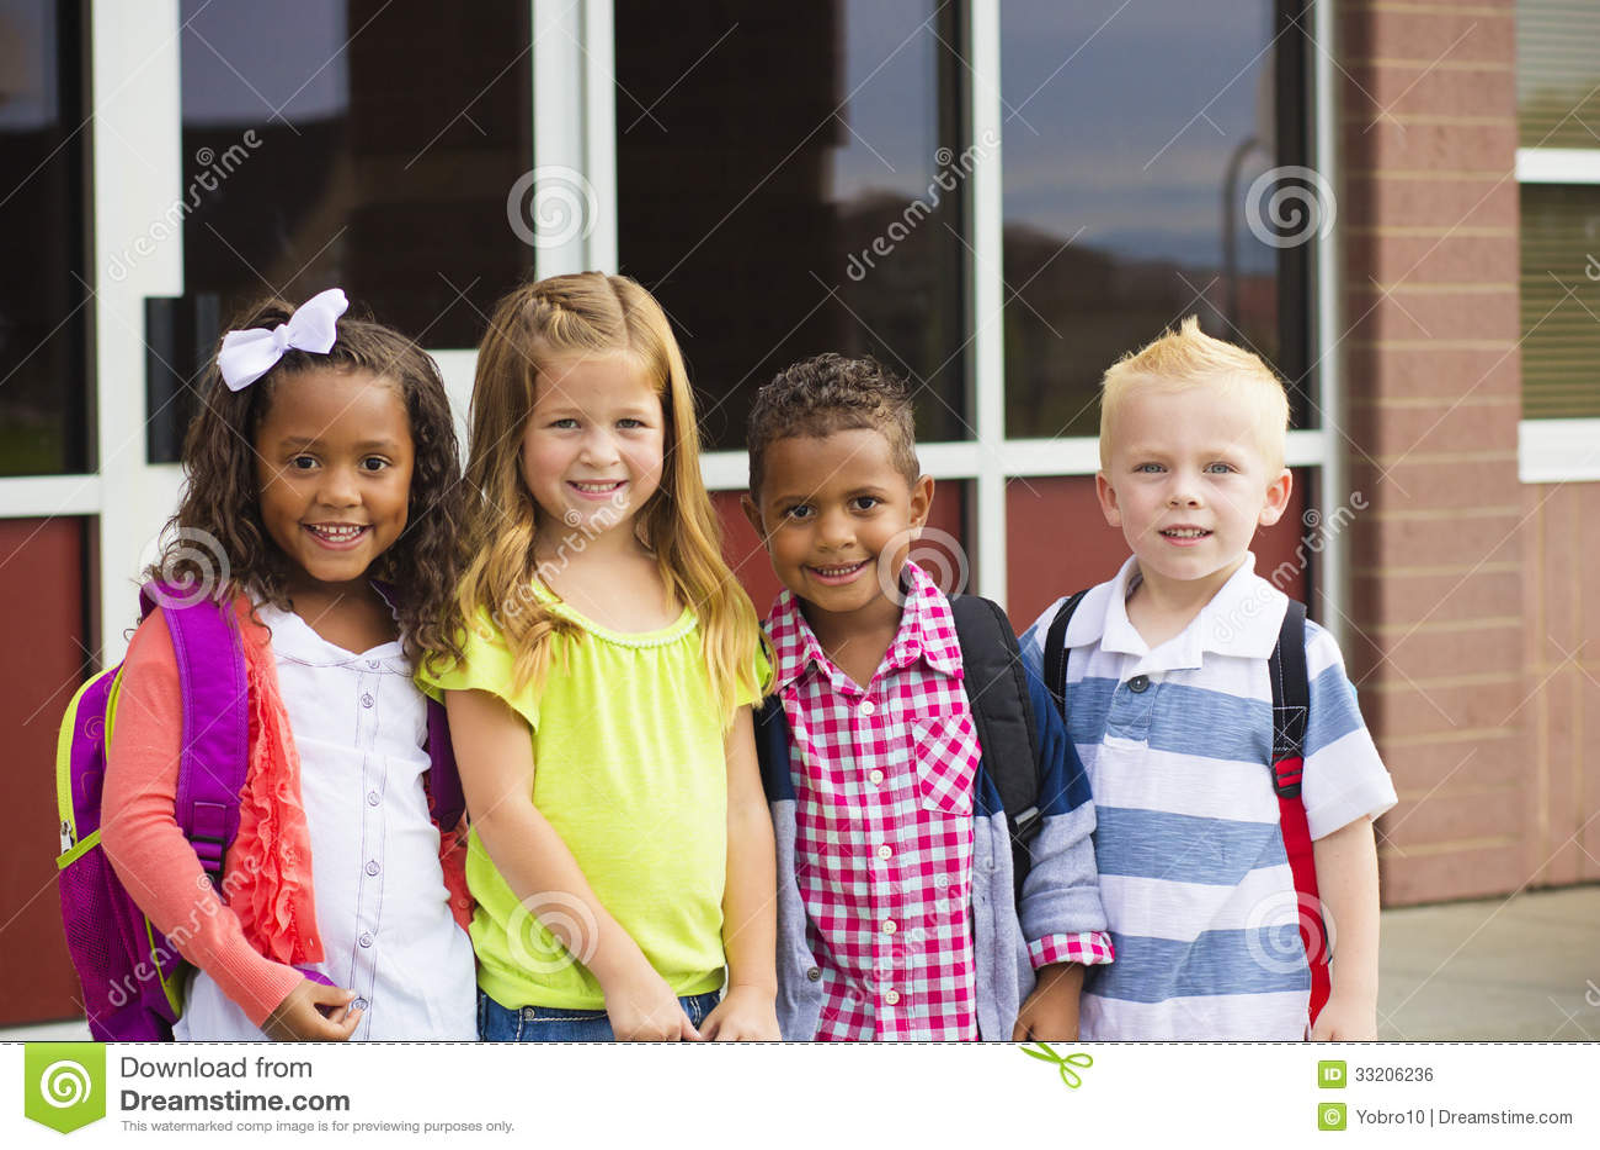 when do kids go to preschool going to school stock photo image of grade 851